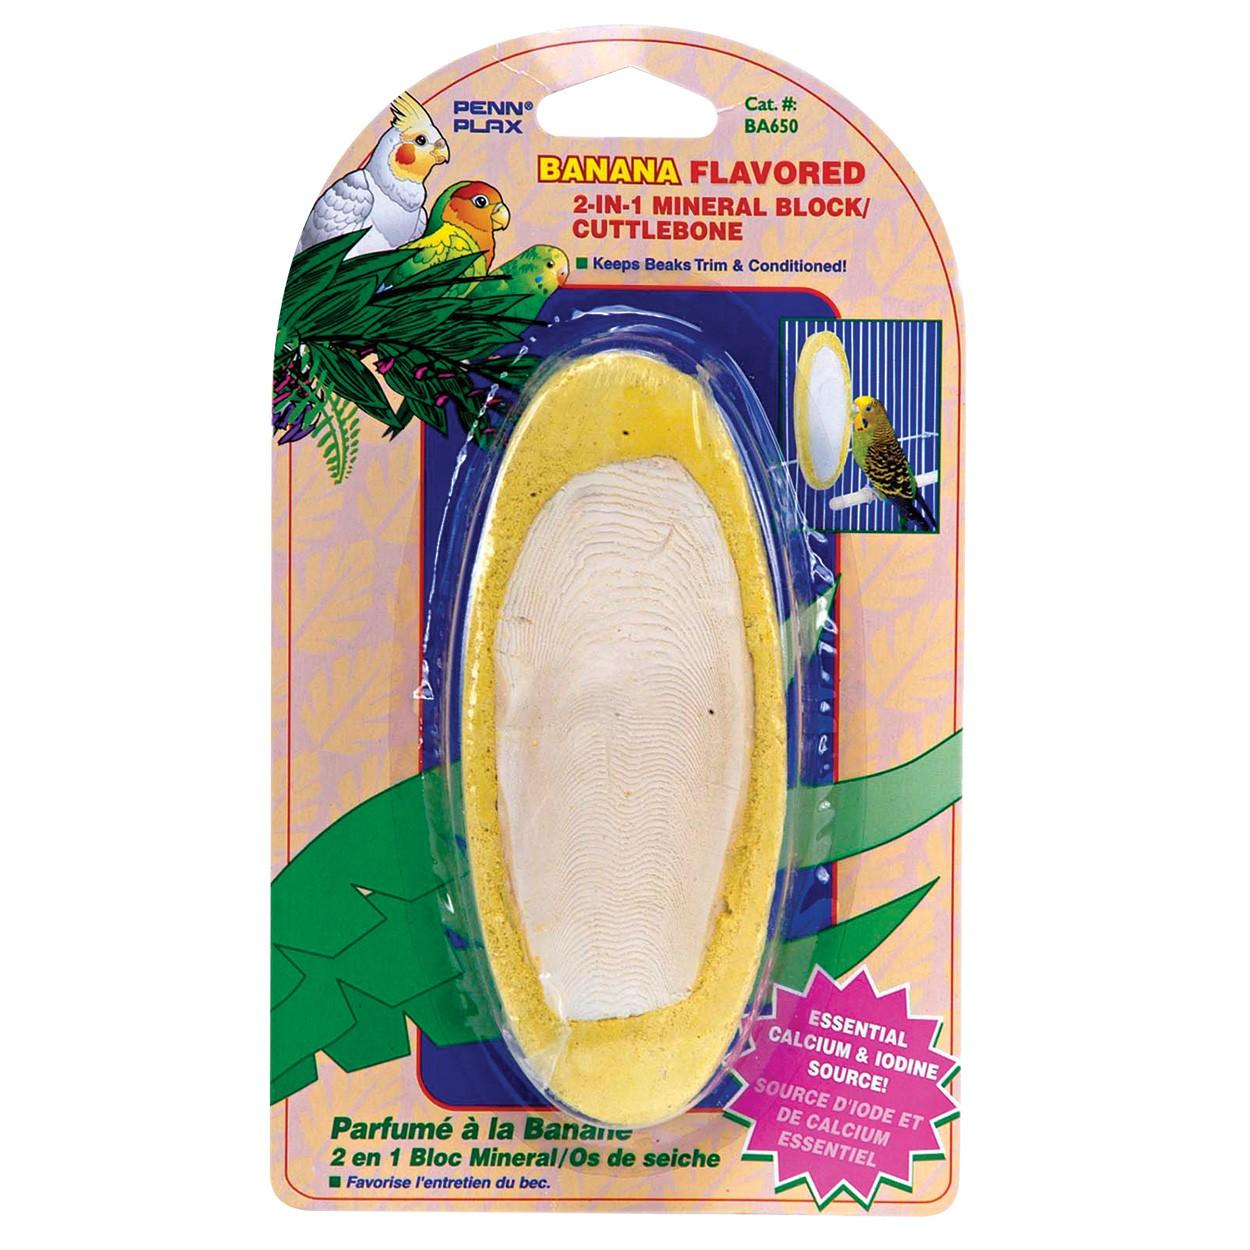 Penn-Plax Banana Flavored Mineral Block/ Cuttlebones Bird Treats